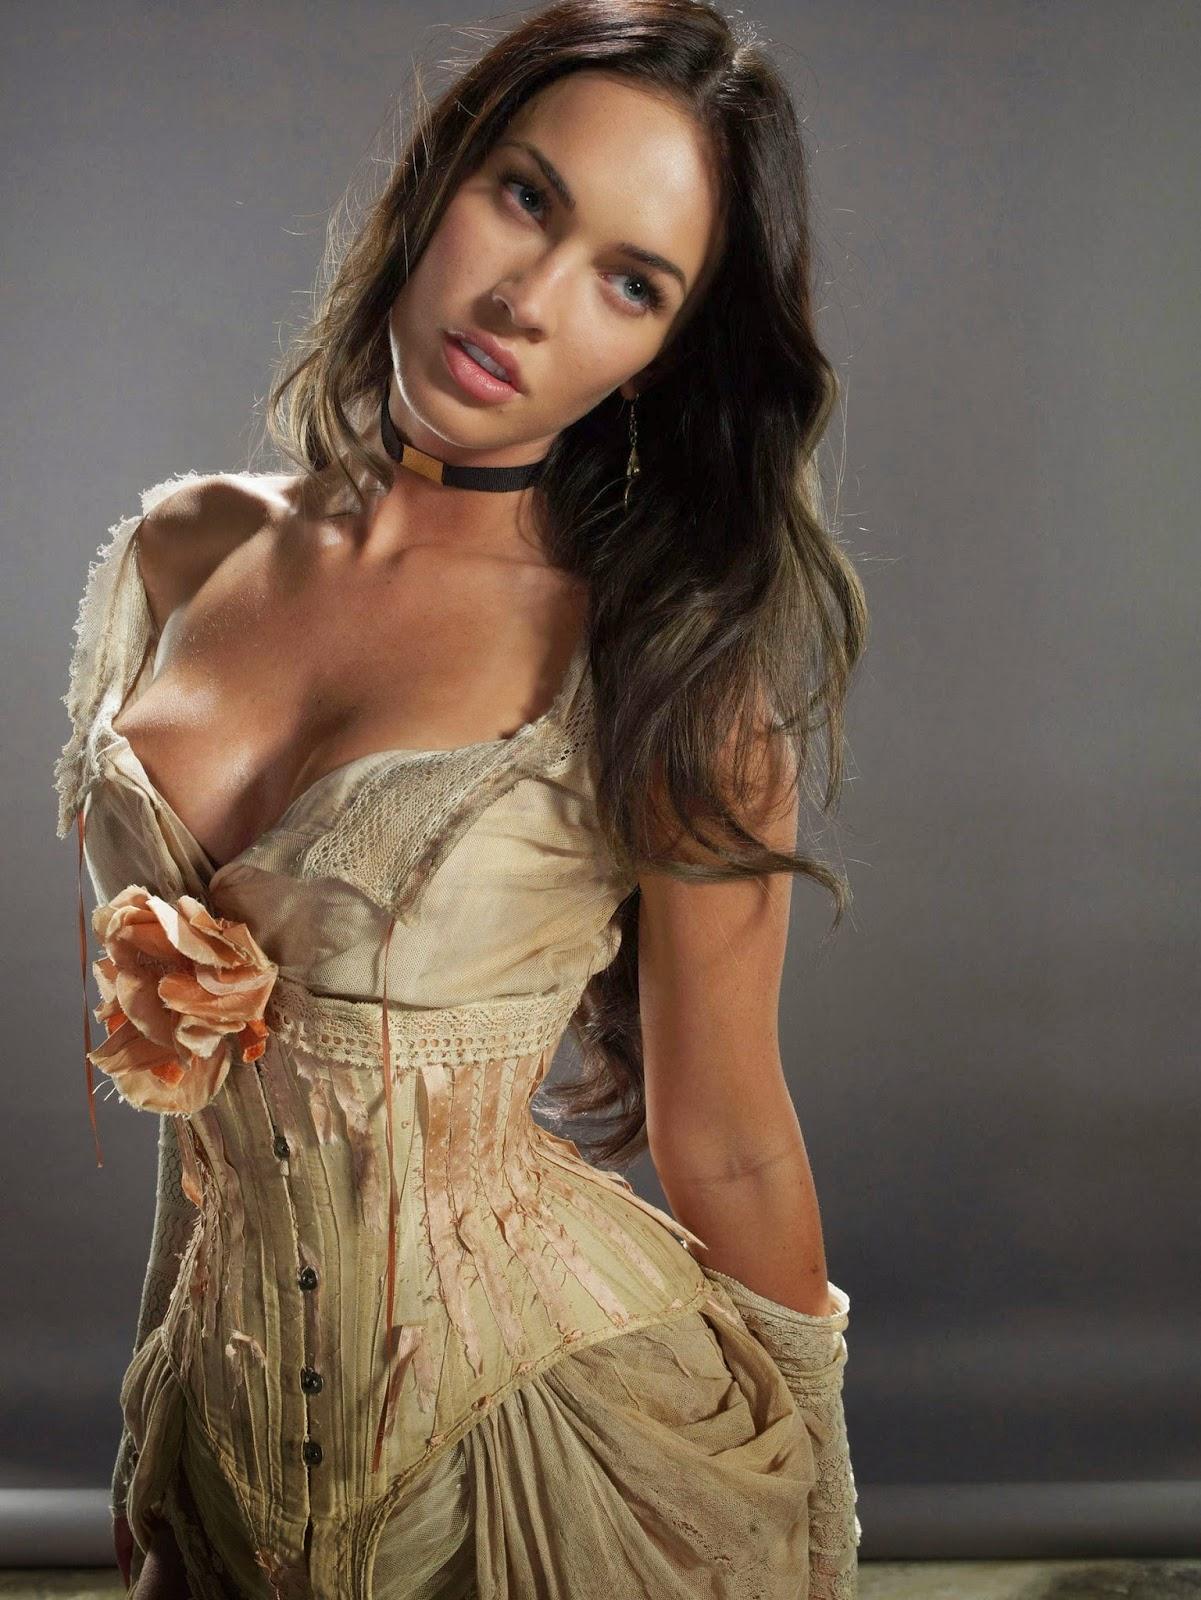 World Hot Actress: Megan Fox mini hot Avon Instinct